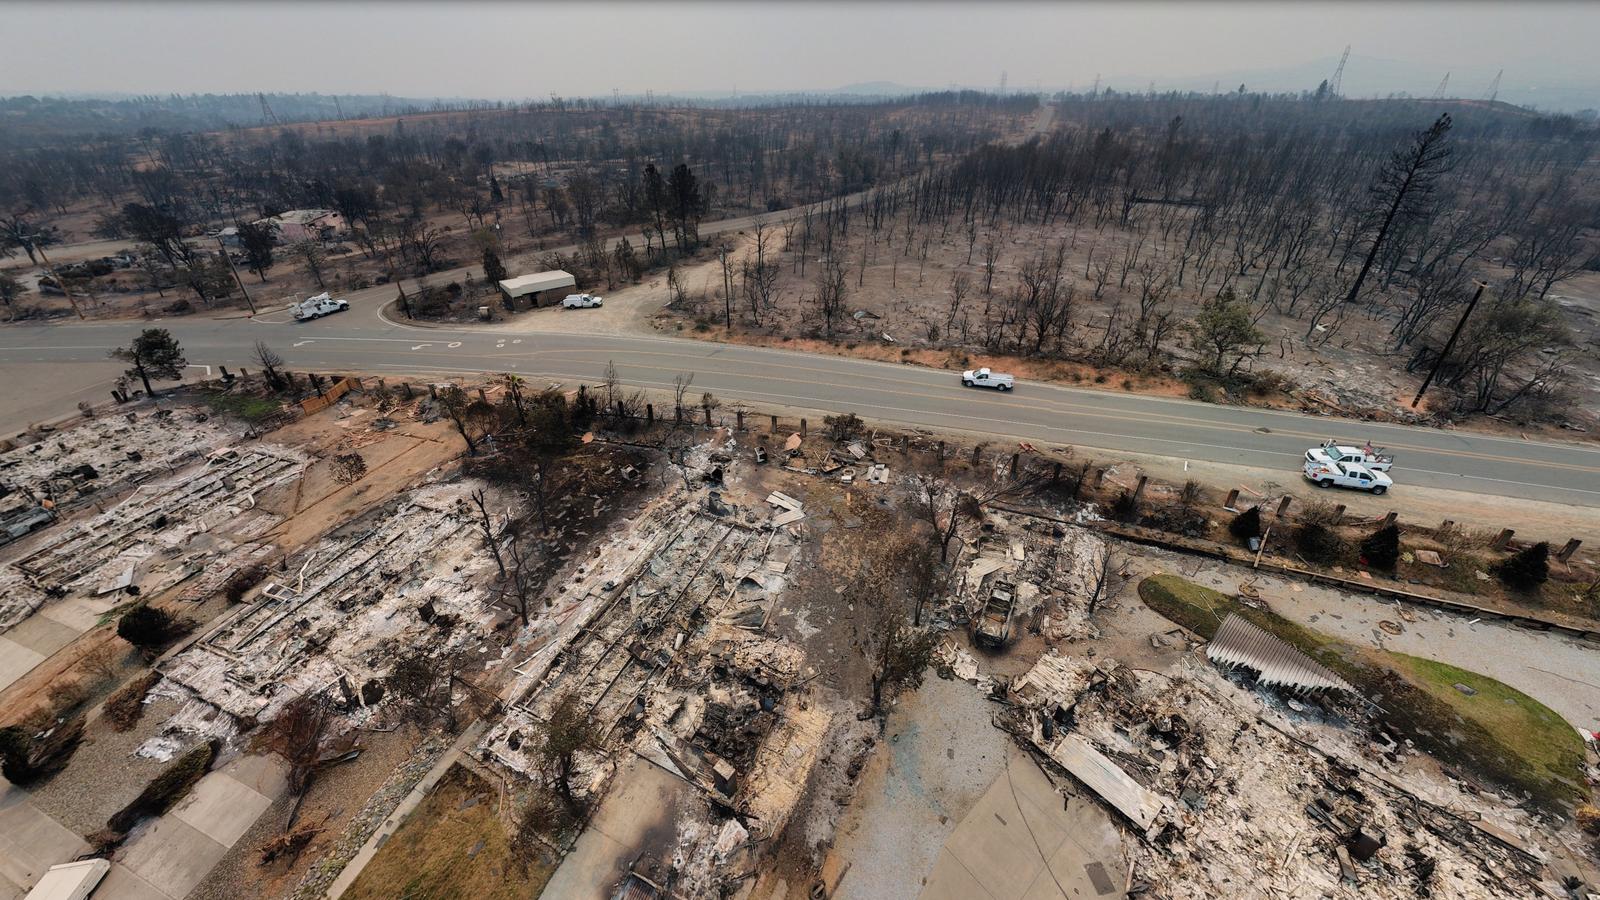 Aerial Photos Reveal the True Horror of the Carr Fire